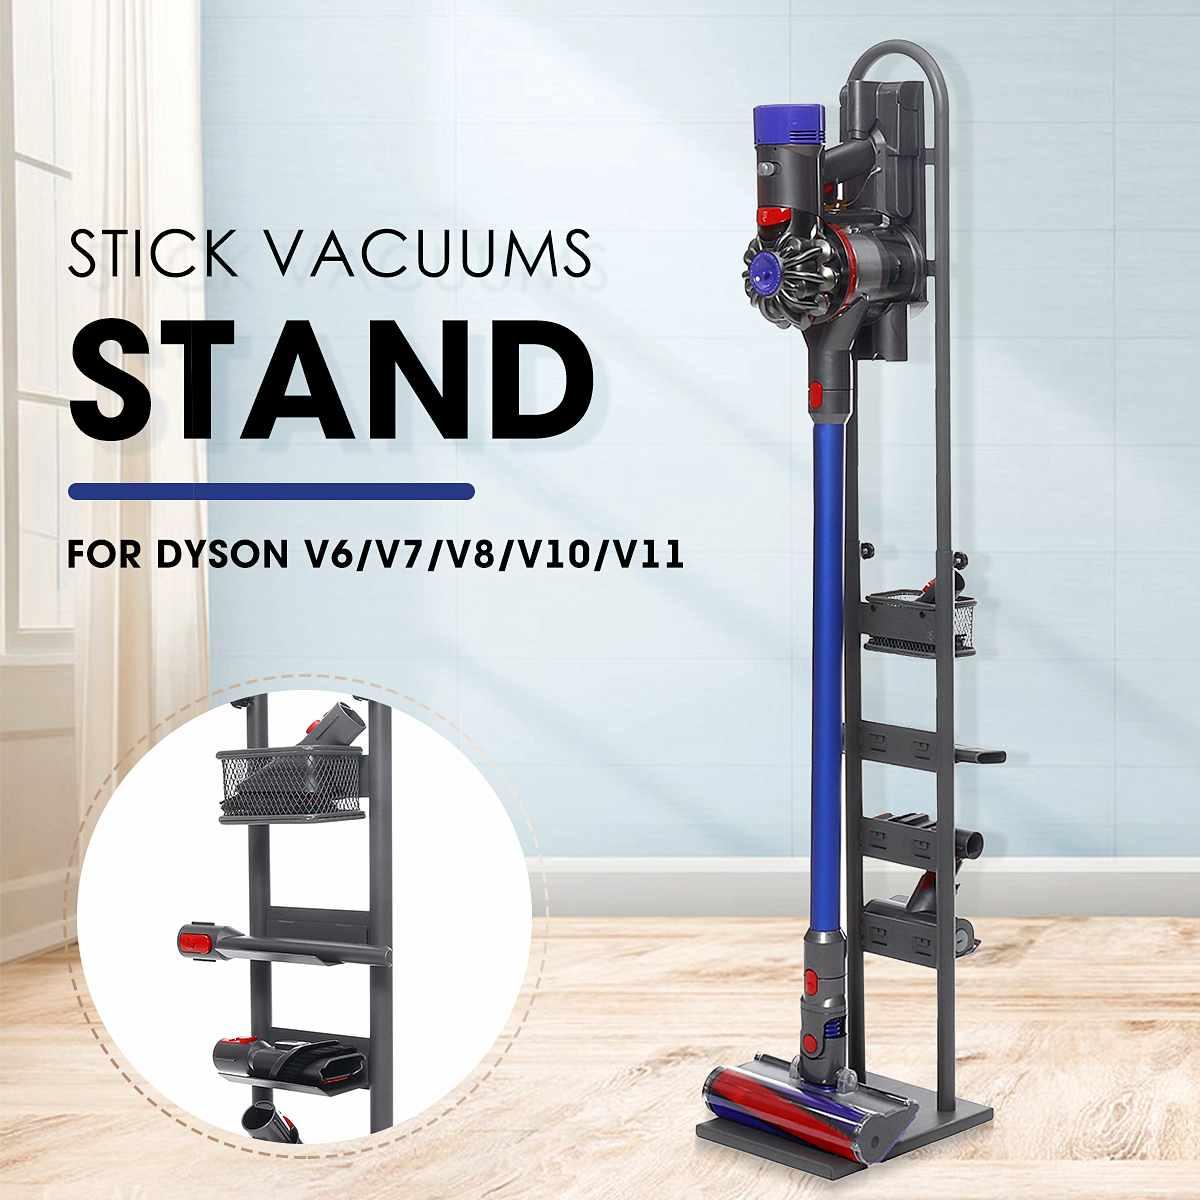 Vacuum Cleaner Storage Basket Rack Steel Stick Stand Home Tool Organizer Holder For Dyson V6 V7 V8 V10 V11 Cleaner Freestanding